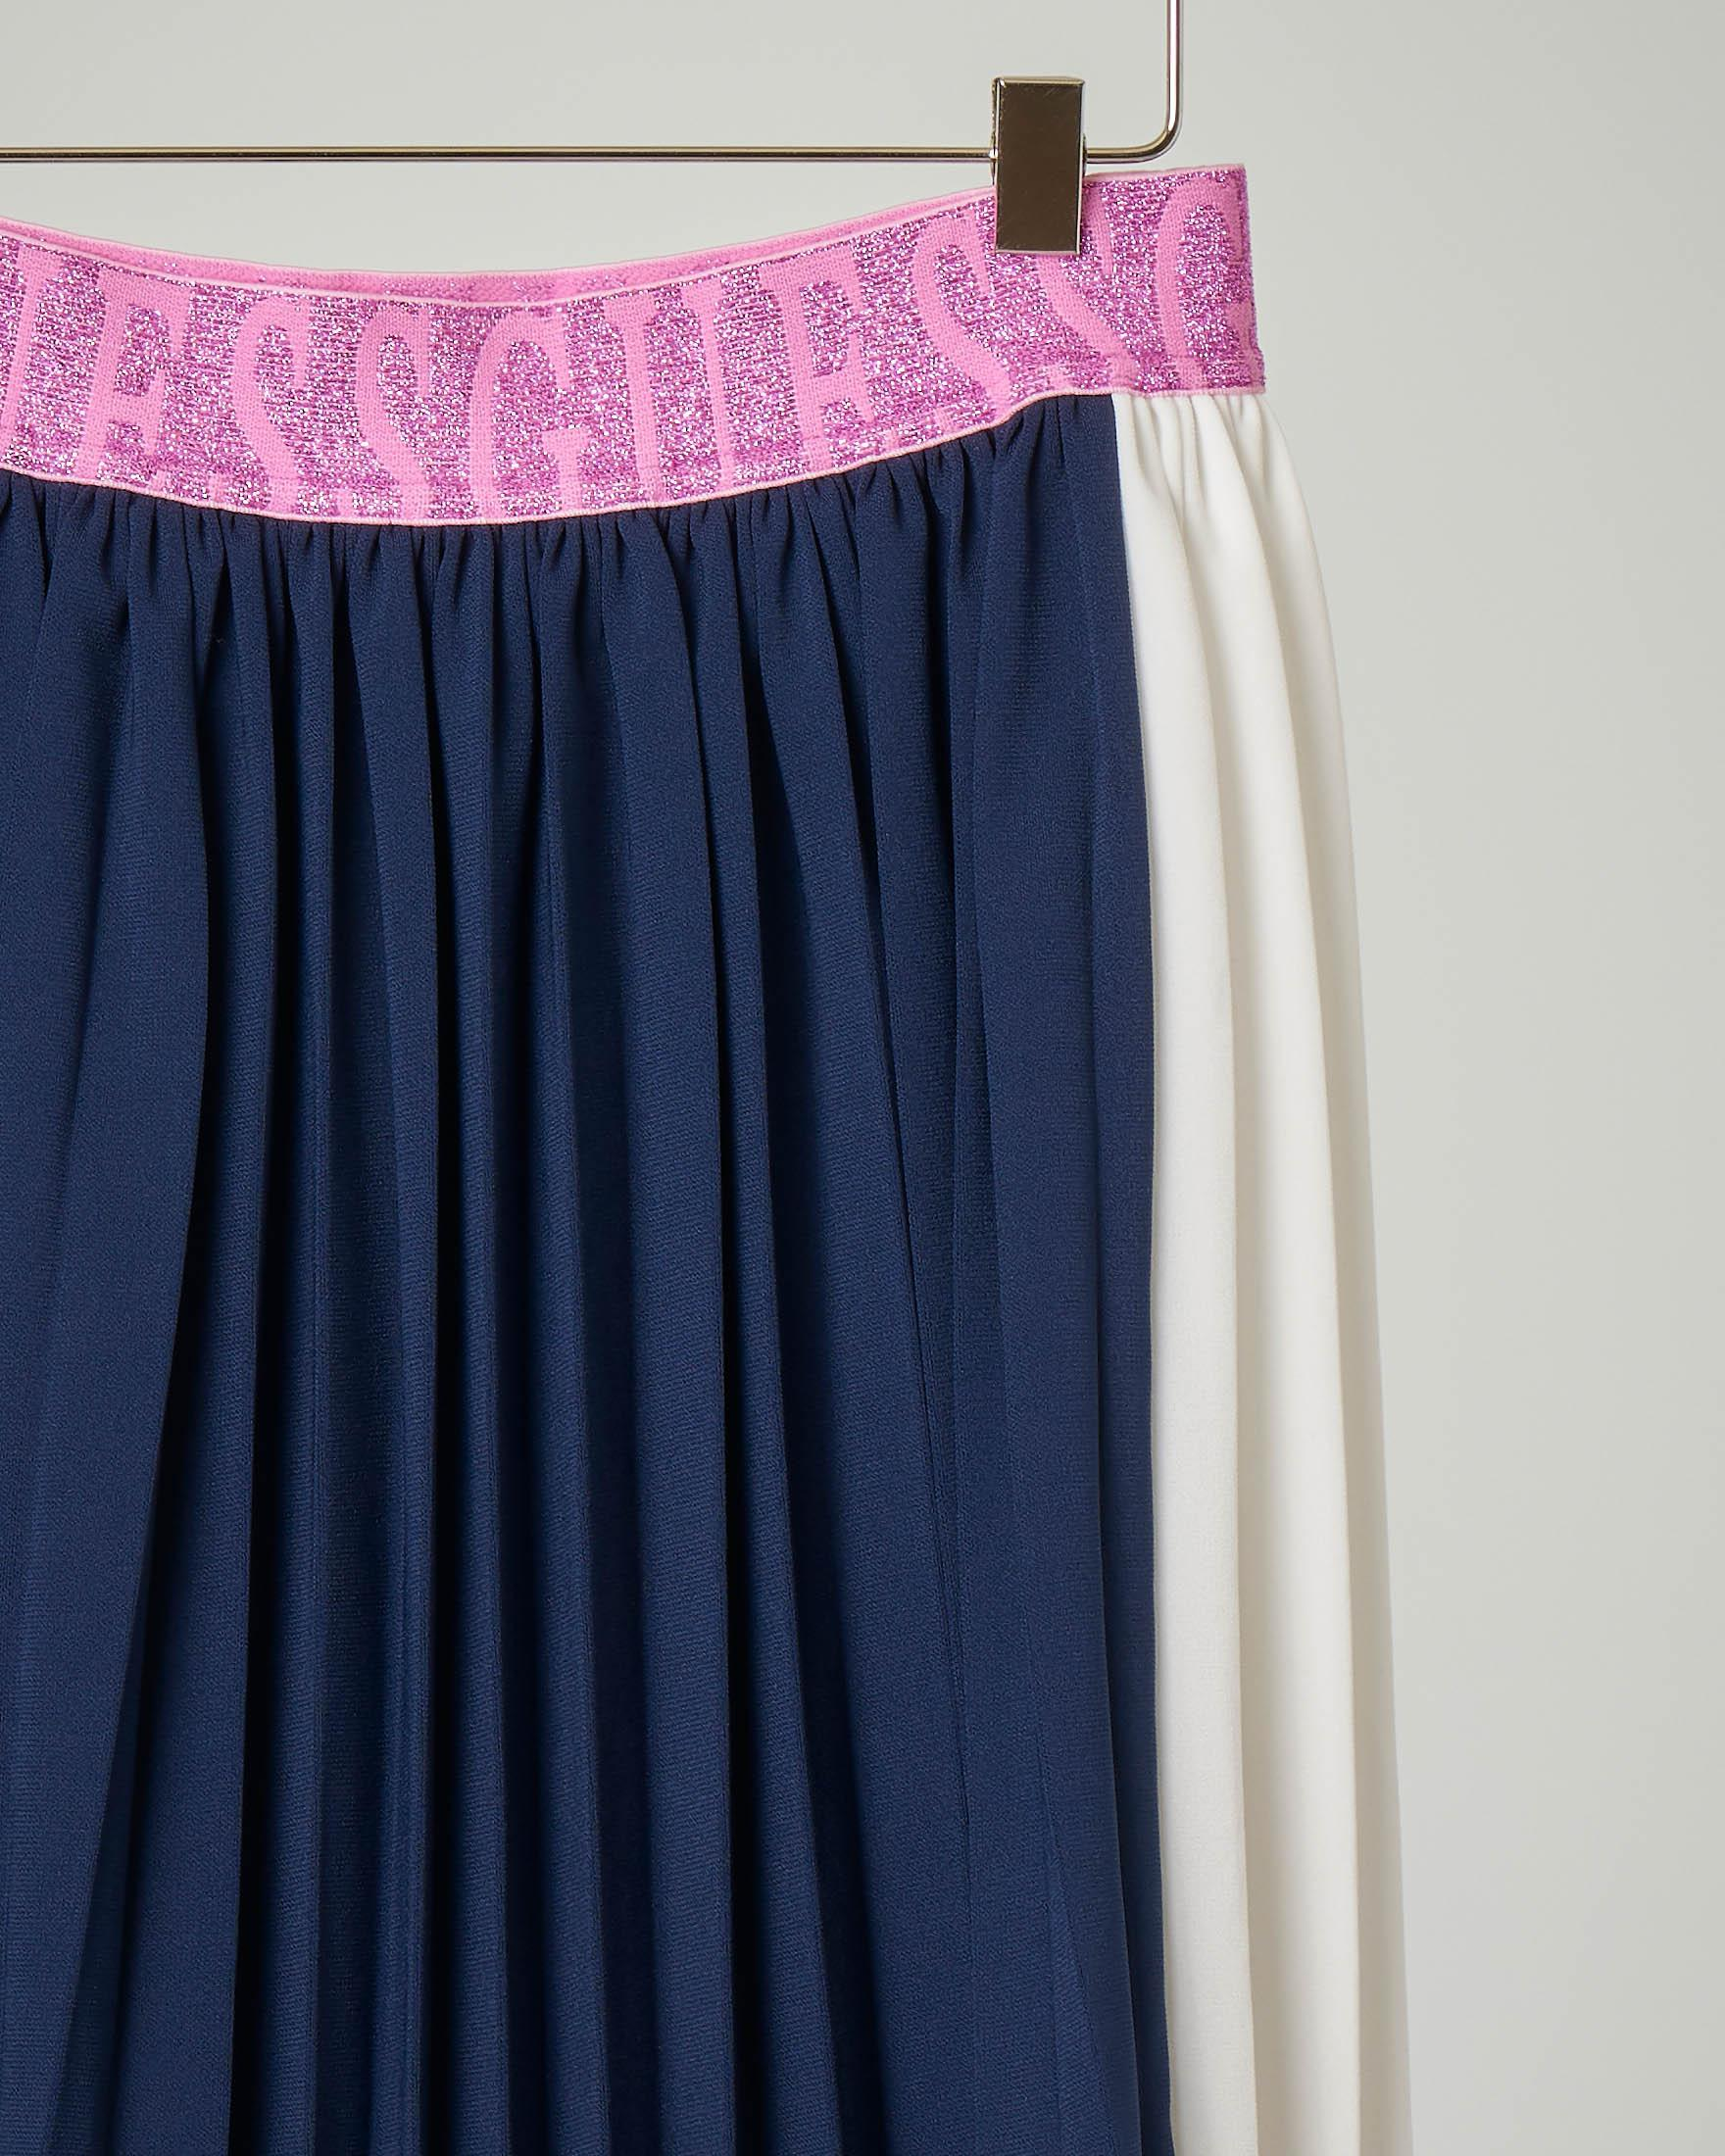 Gonna plissè blu con inserti bianchi ai lati e fascia in vita fucsia 8-14 anni